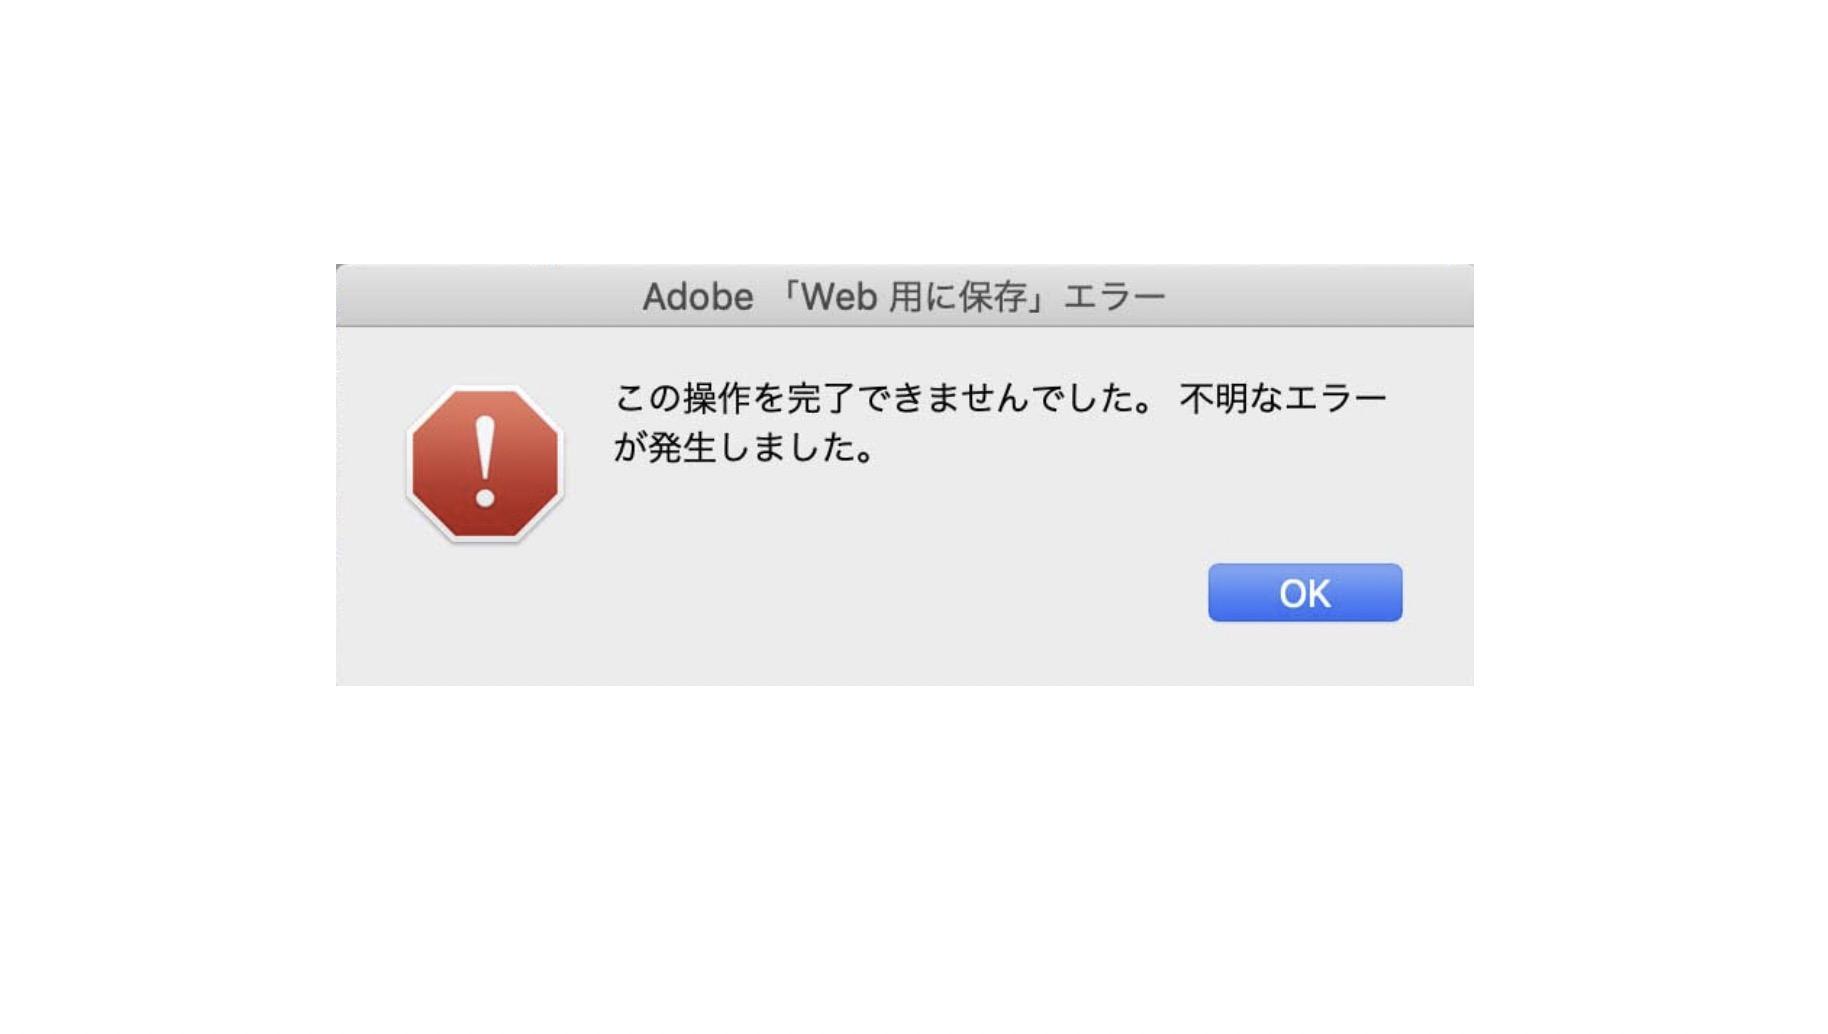 Photoshop (Ver 22.1.1) Adobe「Web用に保存 :不明なエラー」ができない時の対処方法